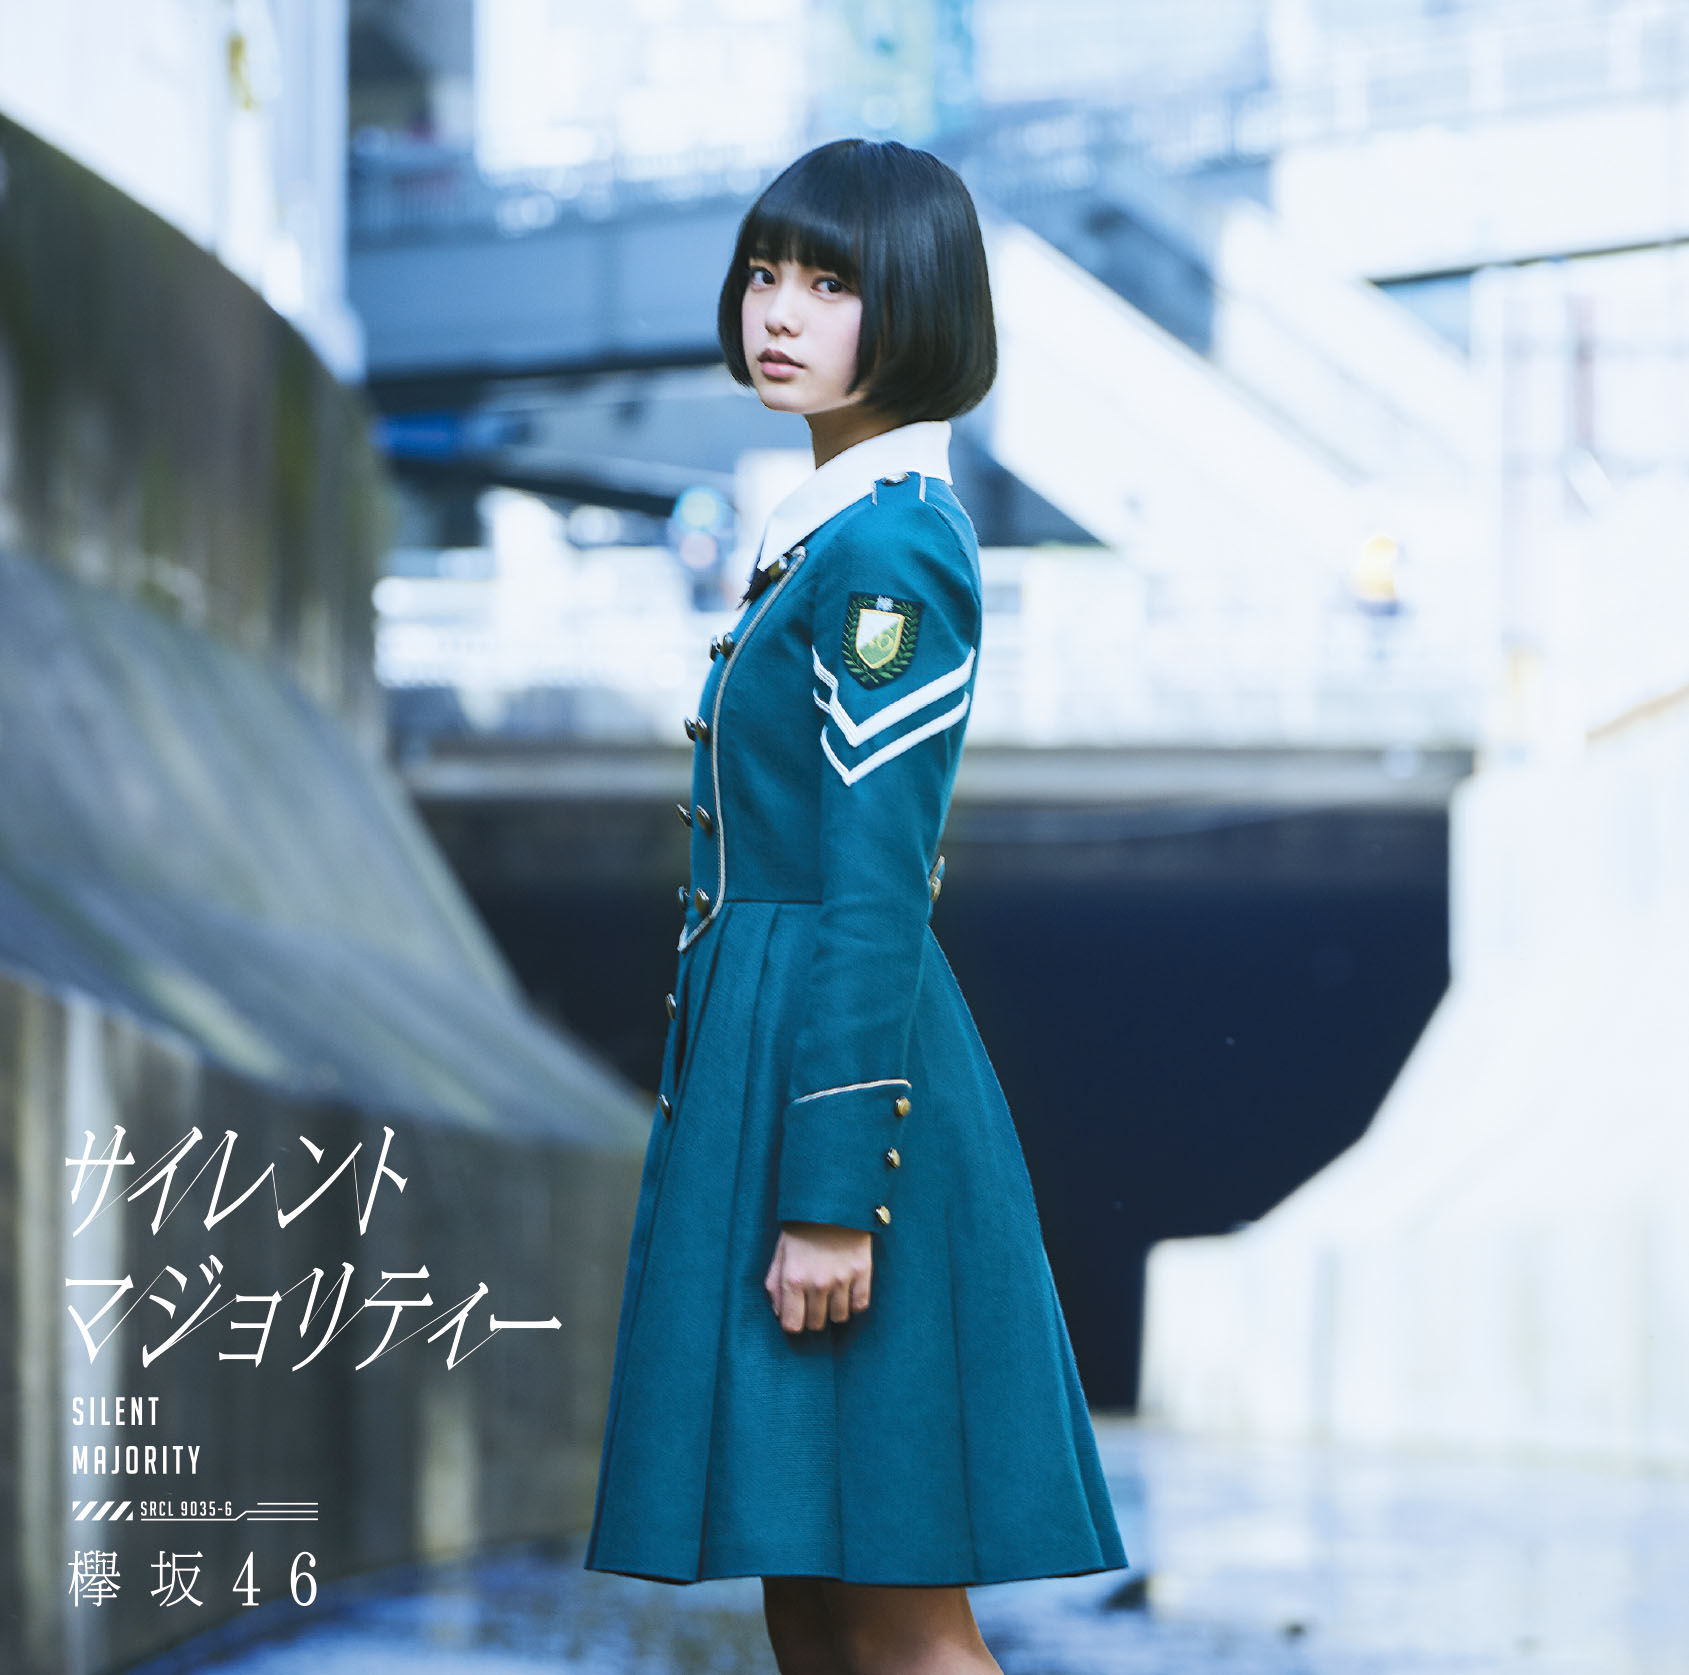 20160423.15.10 Keyakizaka46 - Silent Majority (Regular edition) cover 1.jpg